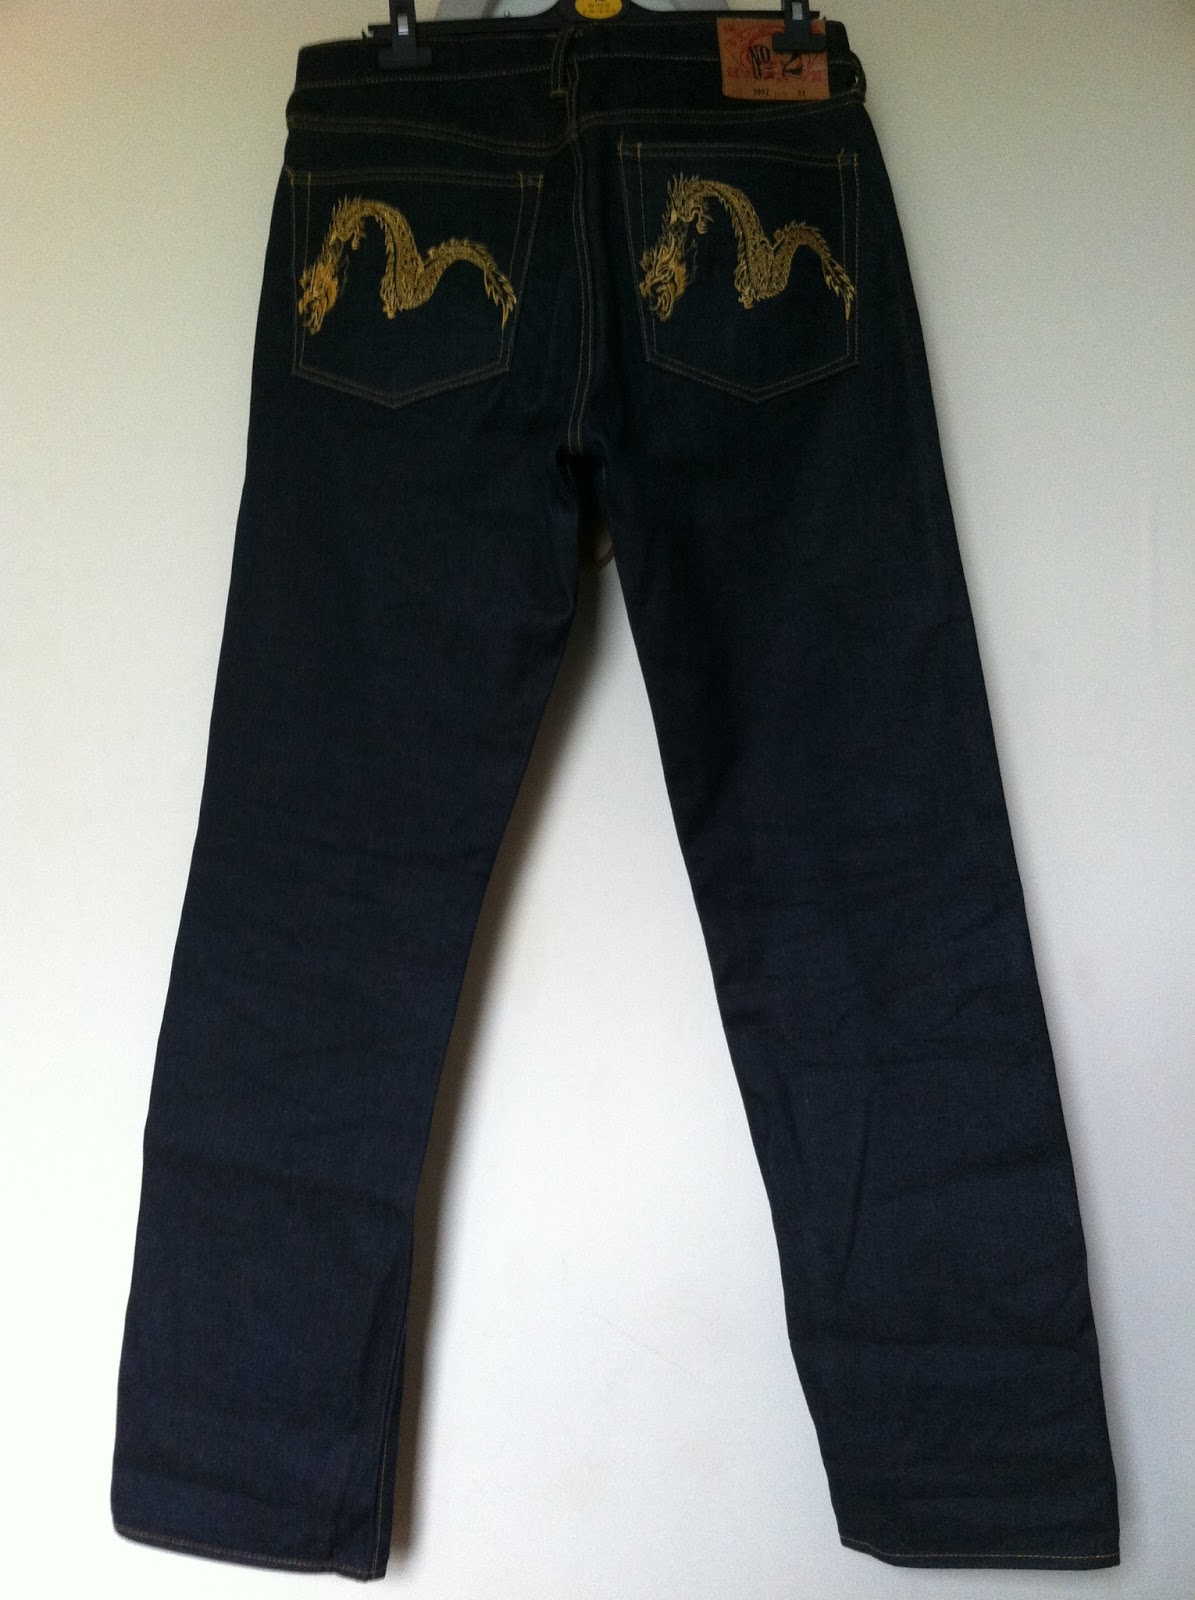 azim wiganuk bundle brand new evisu jeans gold dragon